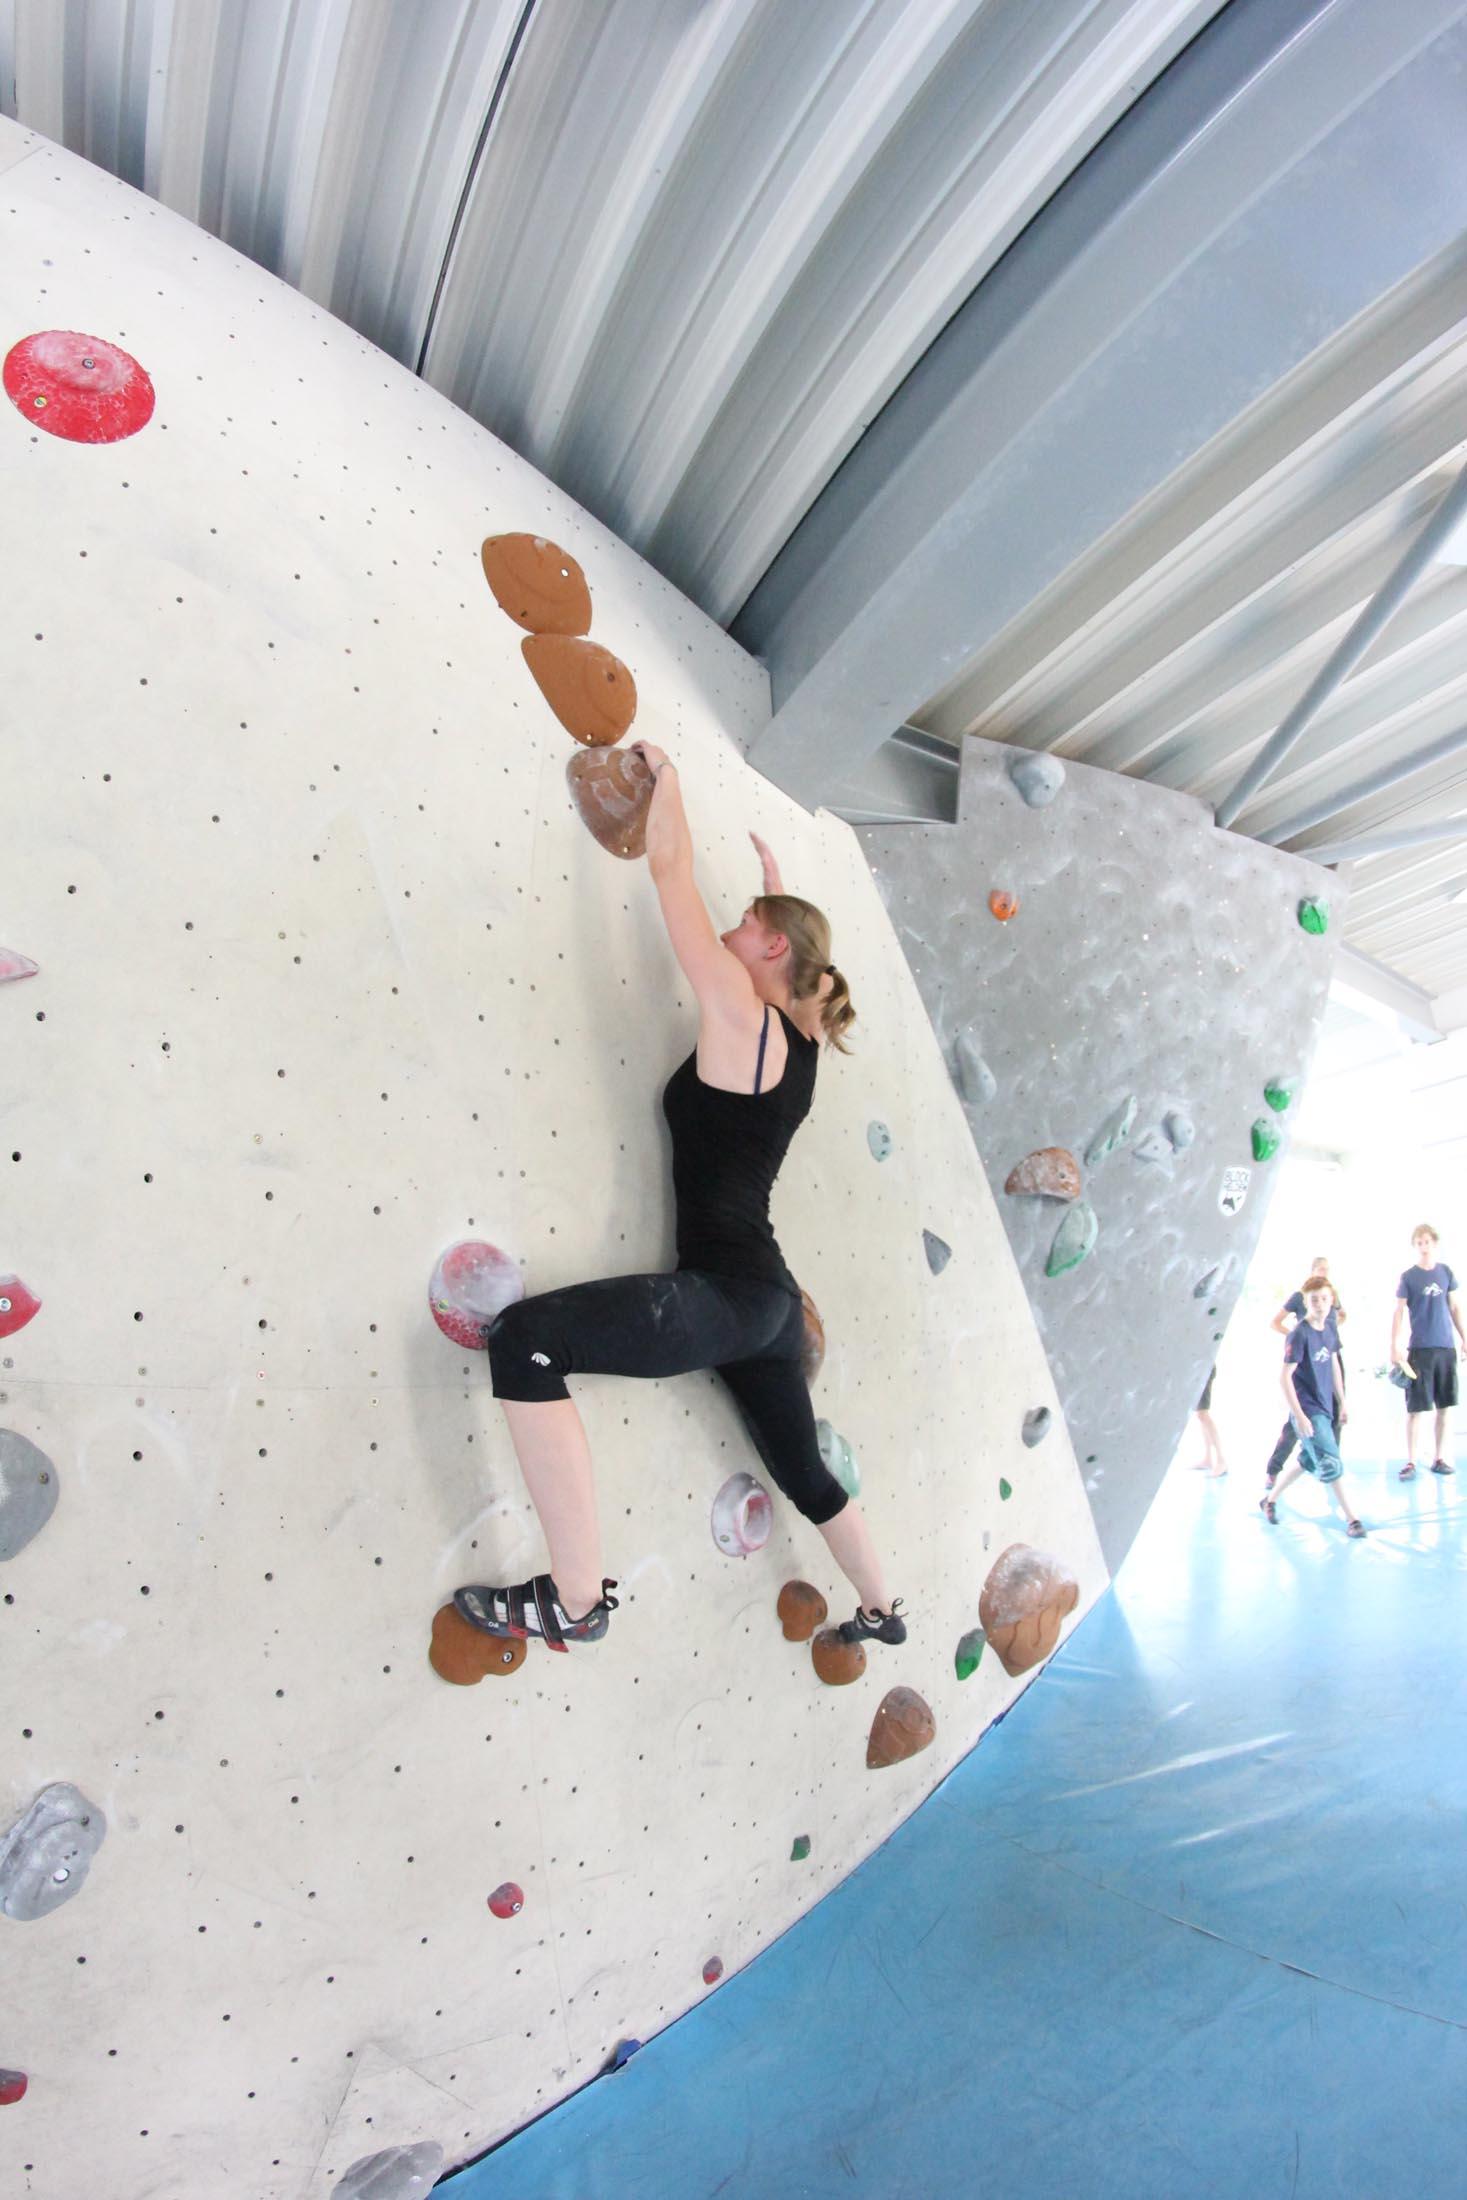 Quali, internationaler bouldercup Frankenjura 2016, BLOCKHELDEN Erlangen, Mammut, Bergfreunde.de, Boulderwettkampf07092016119